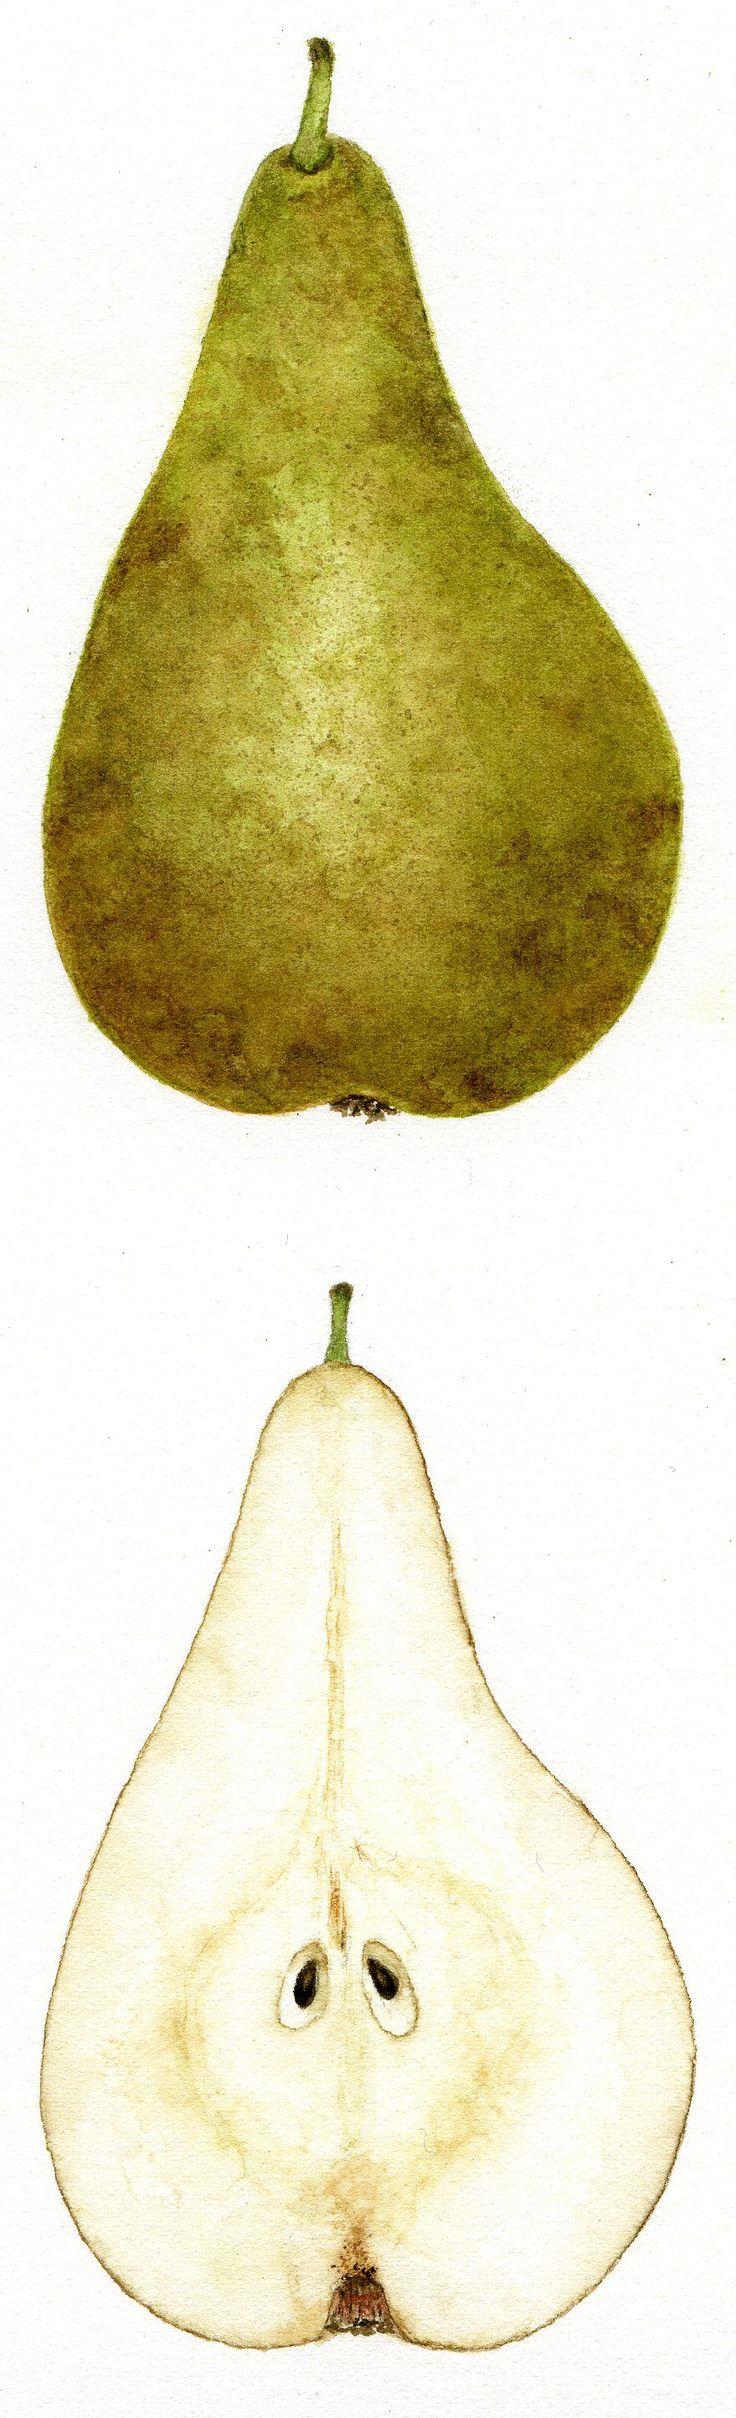 Pear © Jessica Frans